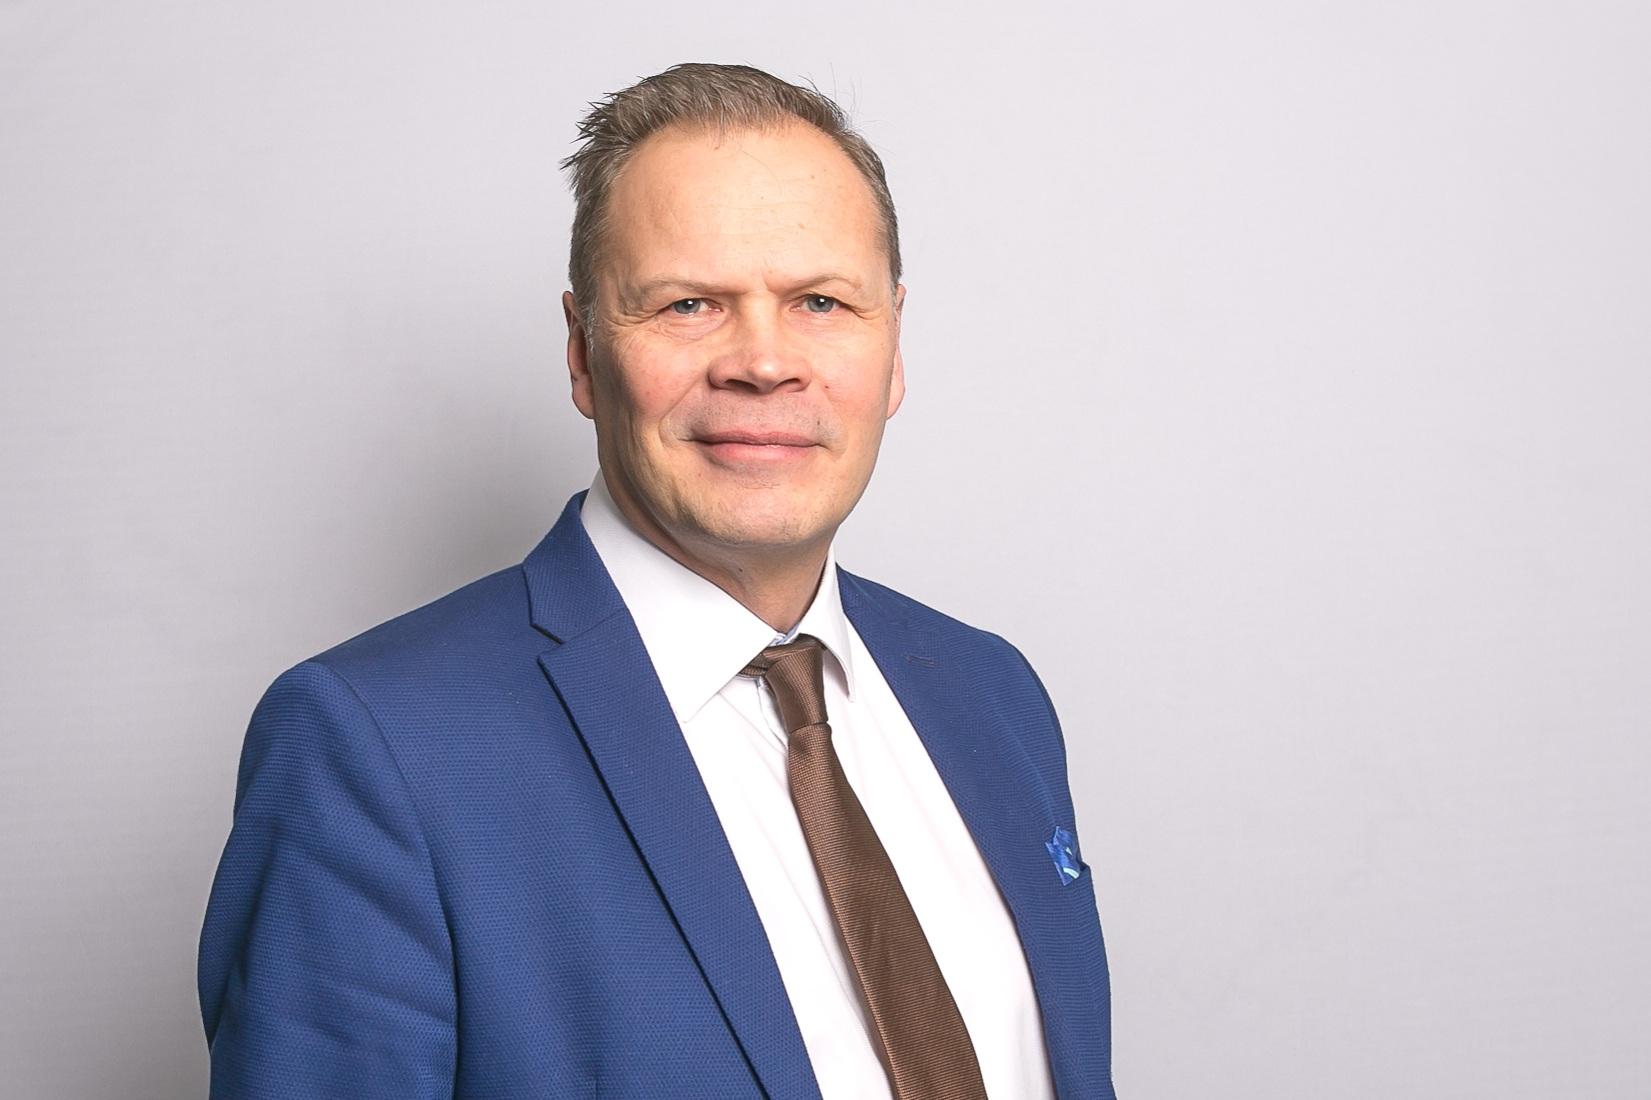 Juha Pitkänen  Growth Director  045 106 4122   juha.pitkanen@springvest.fi   Pk-seutu, Turku